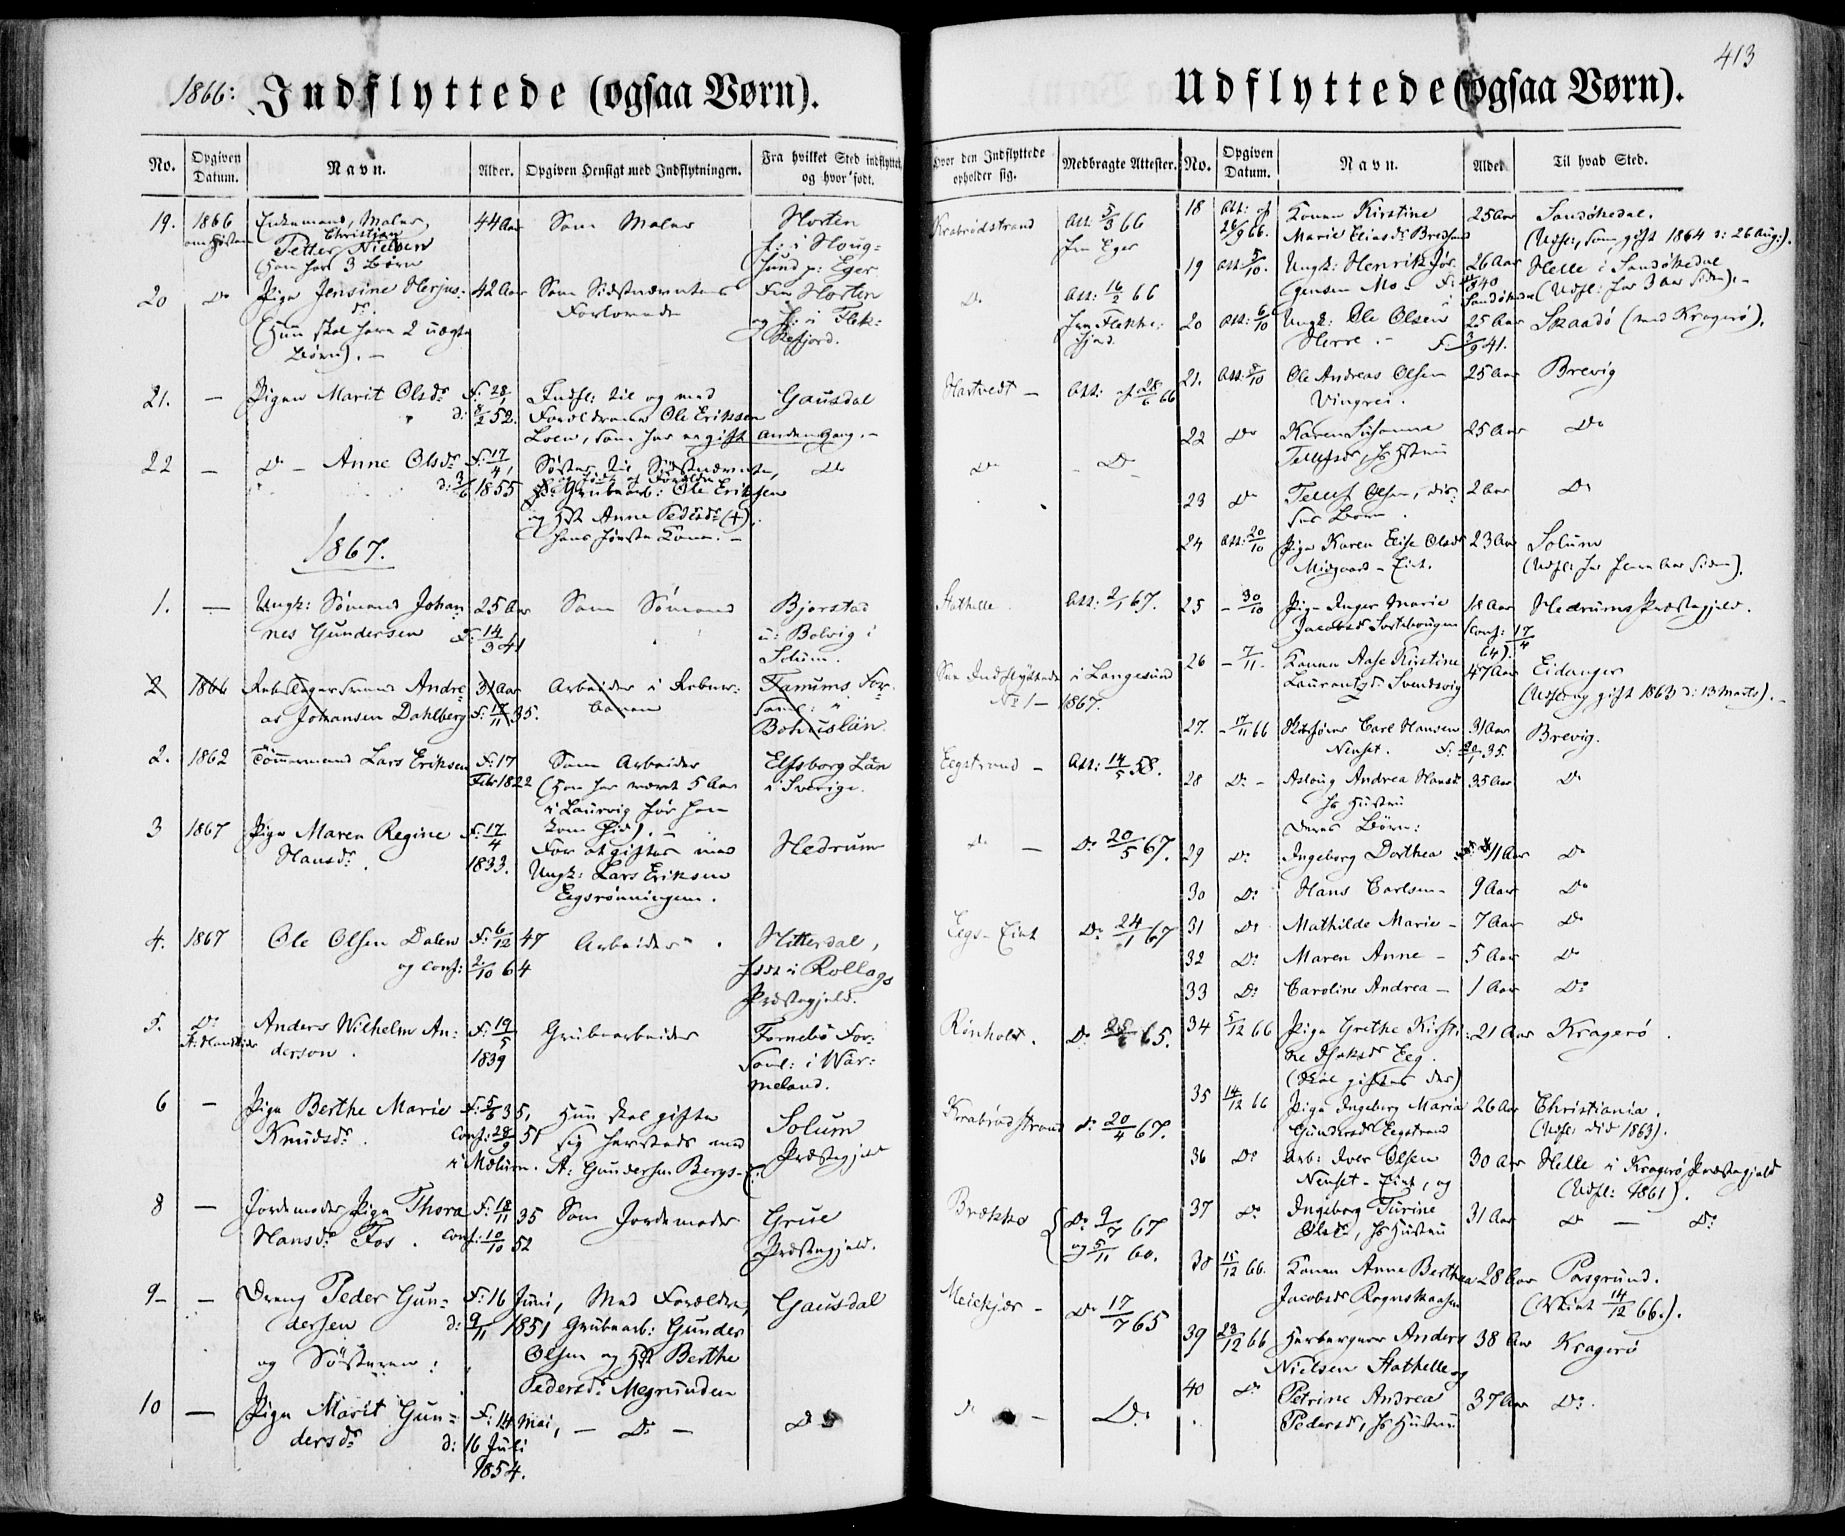 SAKO, Bamble kirkebøker, F/Fa/L0005: Ministerialbok nr. I 5, 1854-1869, s. 413